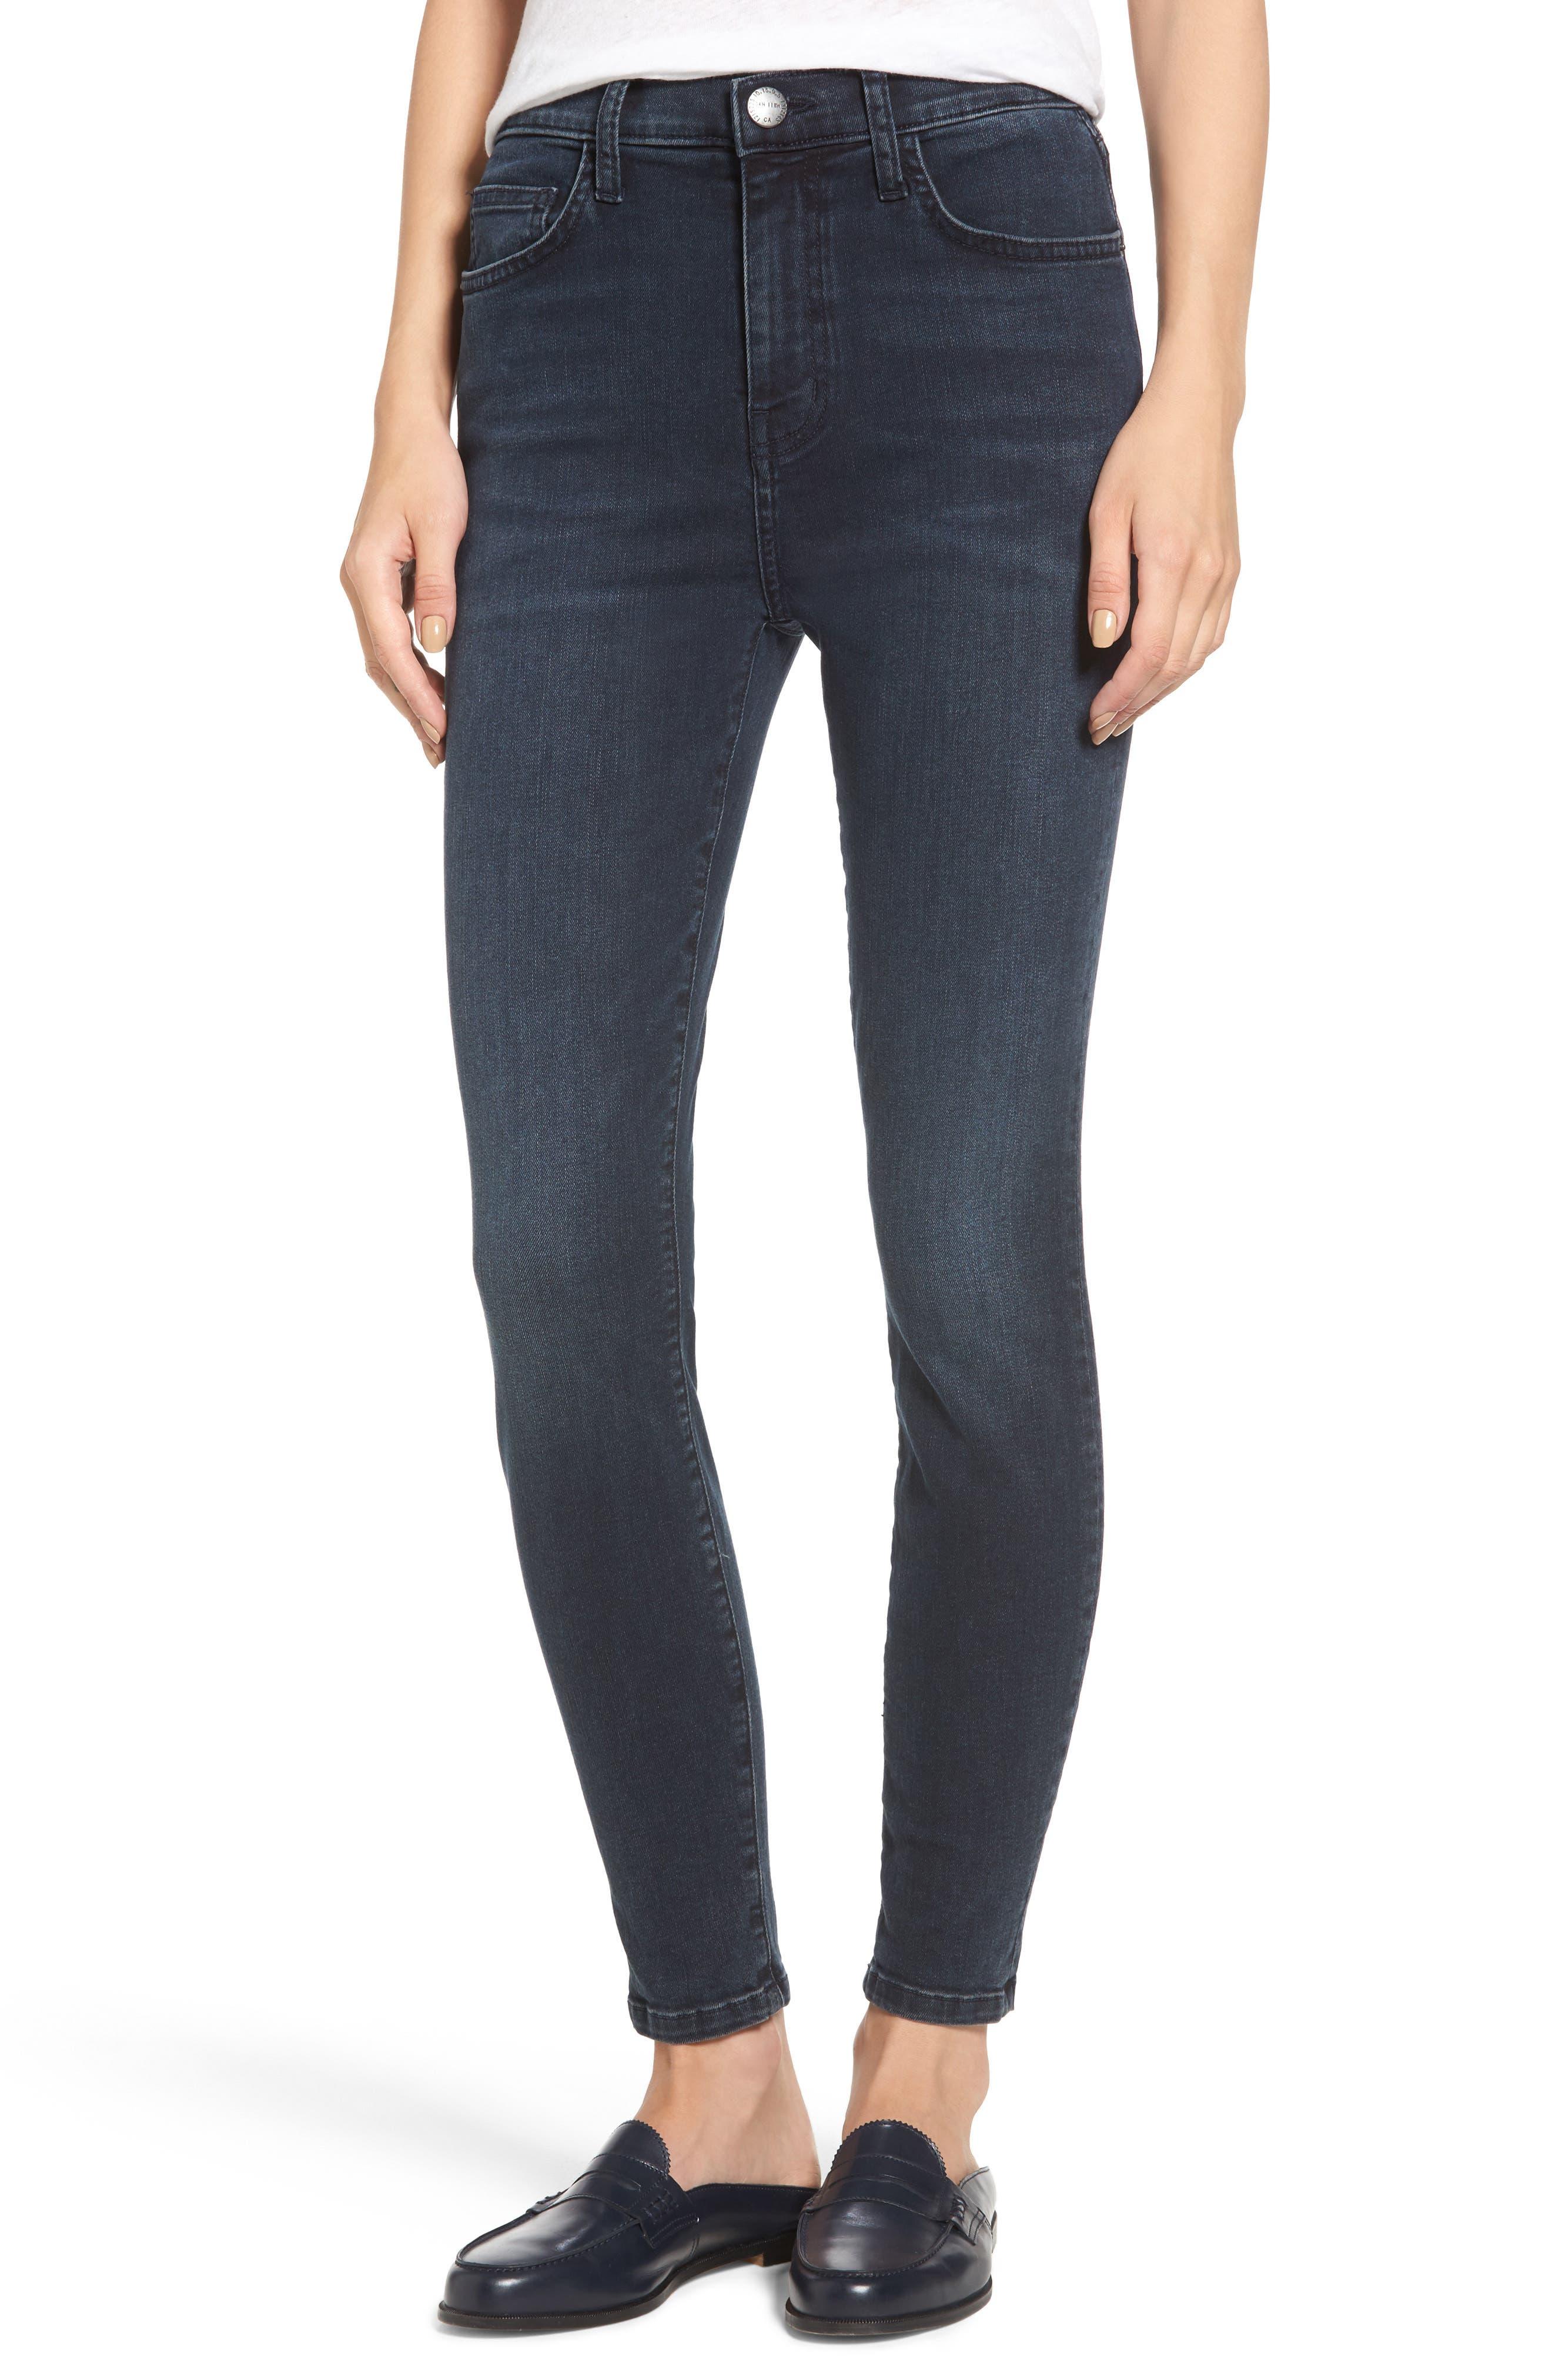 Main Image - Current/Elliott The Super High Waist Stiletto Ankle Skinny Jeans (Tacoma)